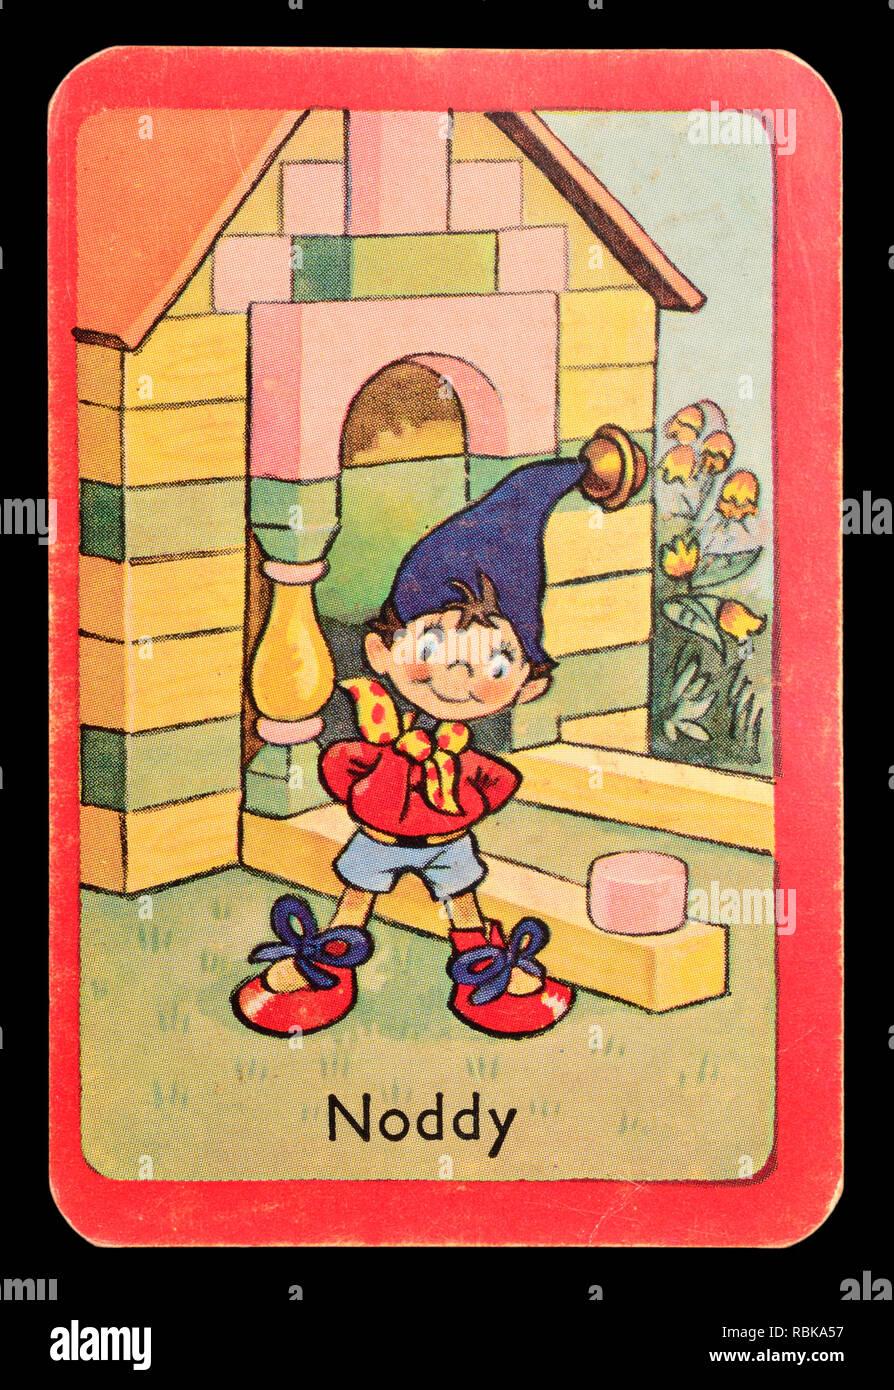 Carta da un Noddy snap gioco di scheda (1955) - Noddy Immagini Stock